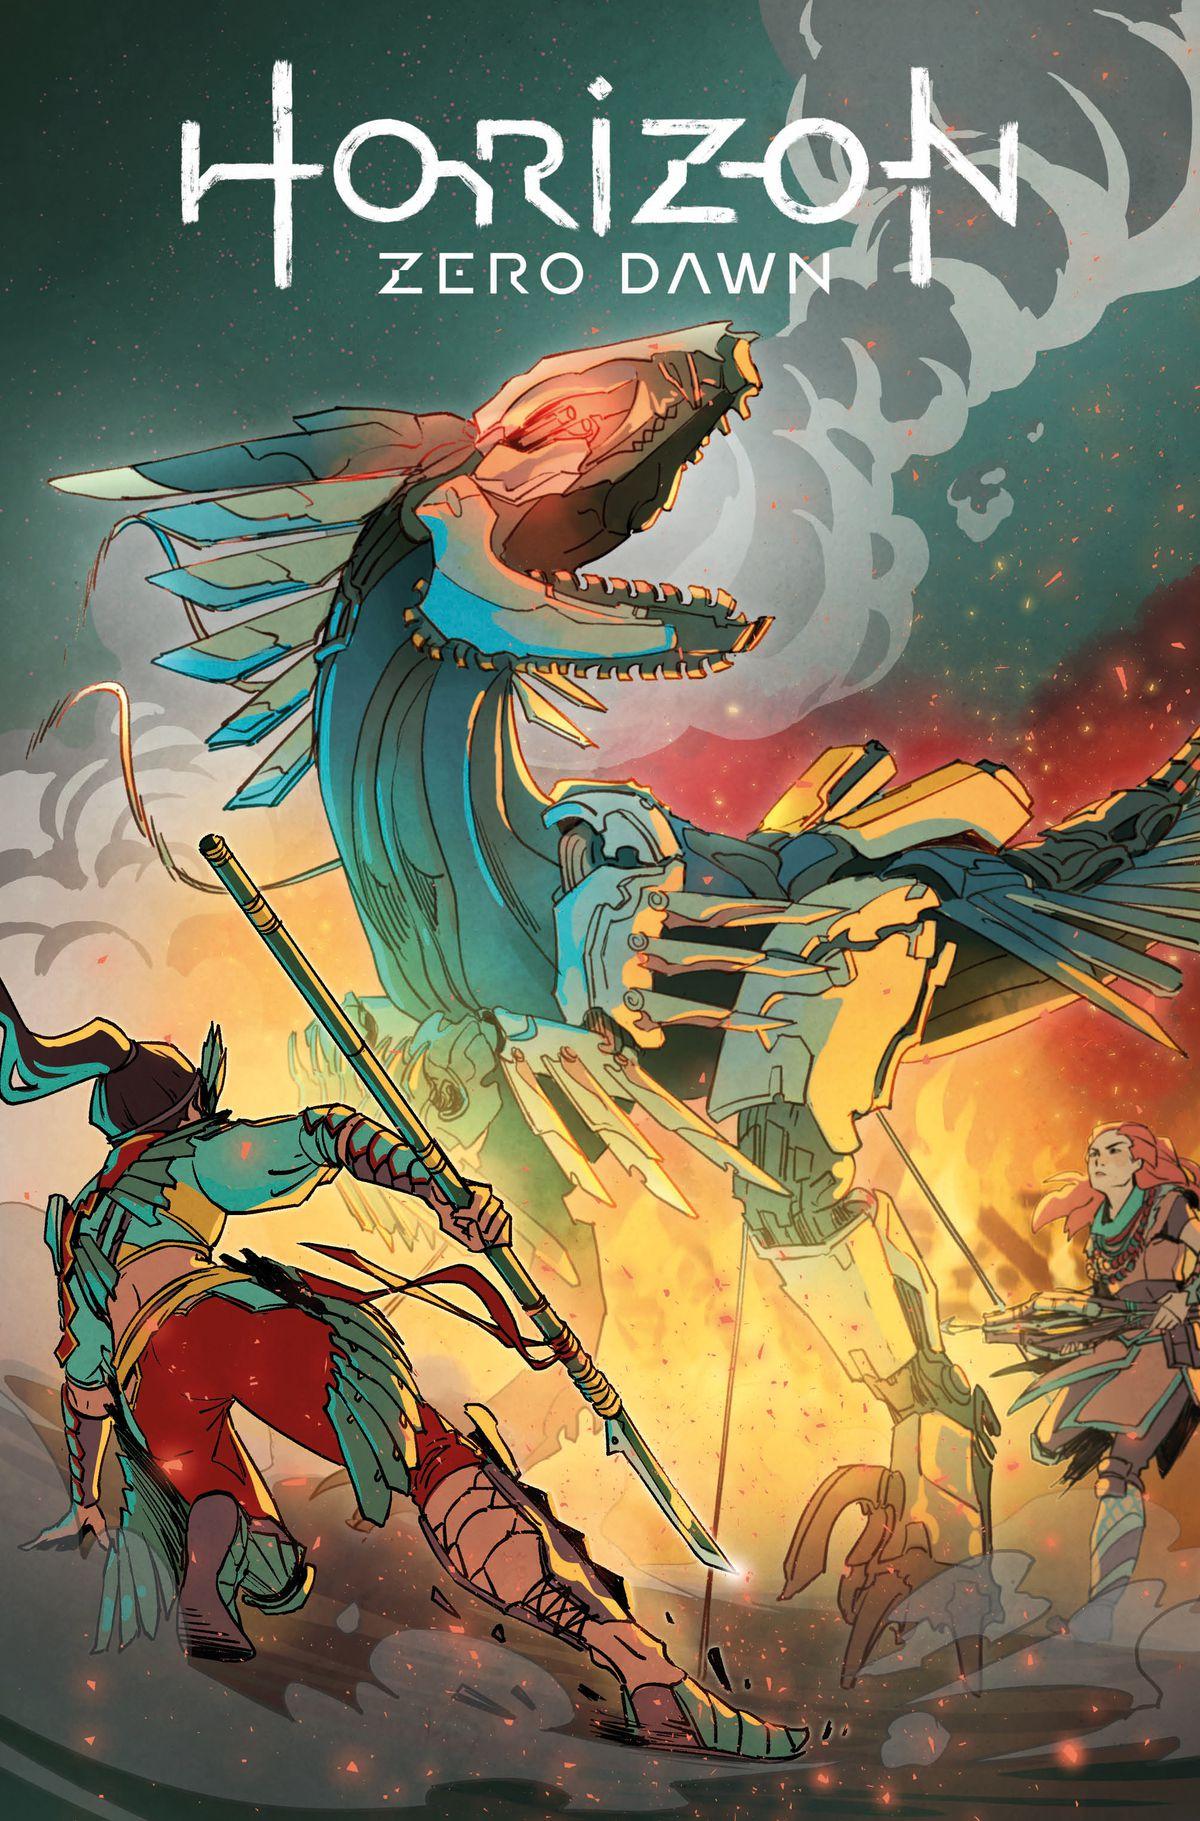 Cover D for Horizon Zero Dawn #1, Titan Comics (2020), with a mechanical dinosaur beast and Talanah